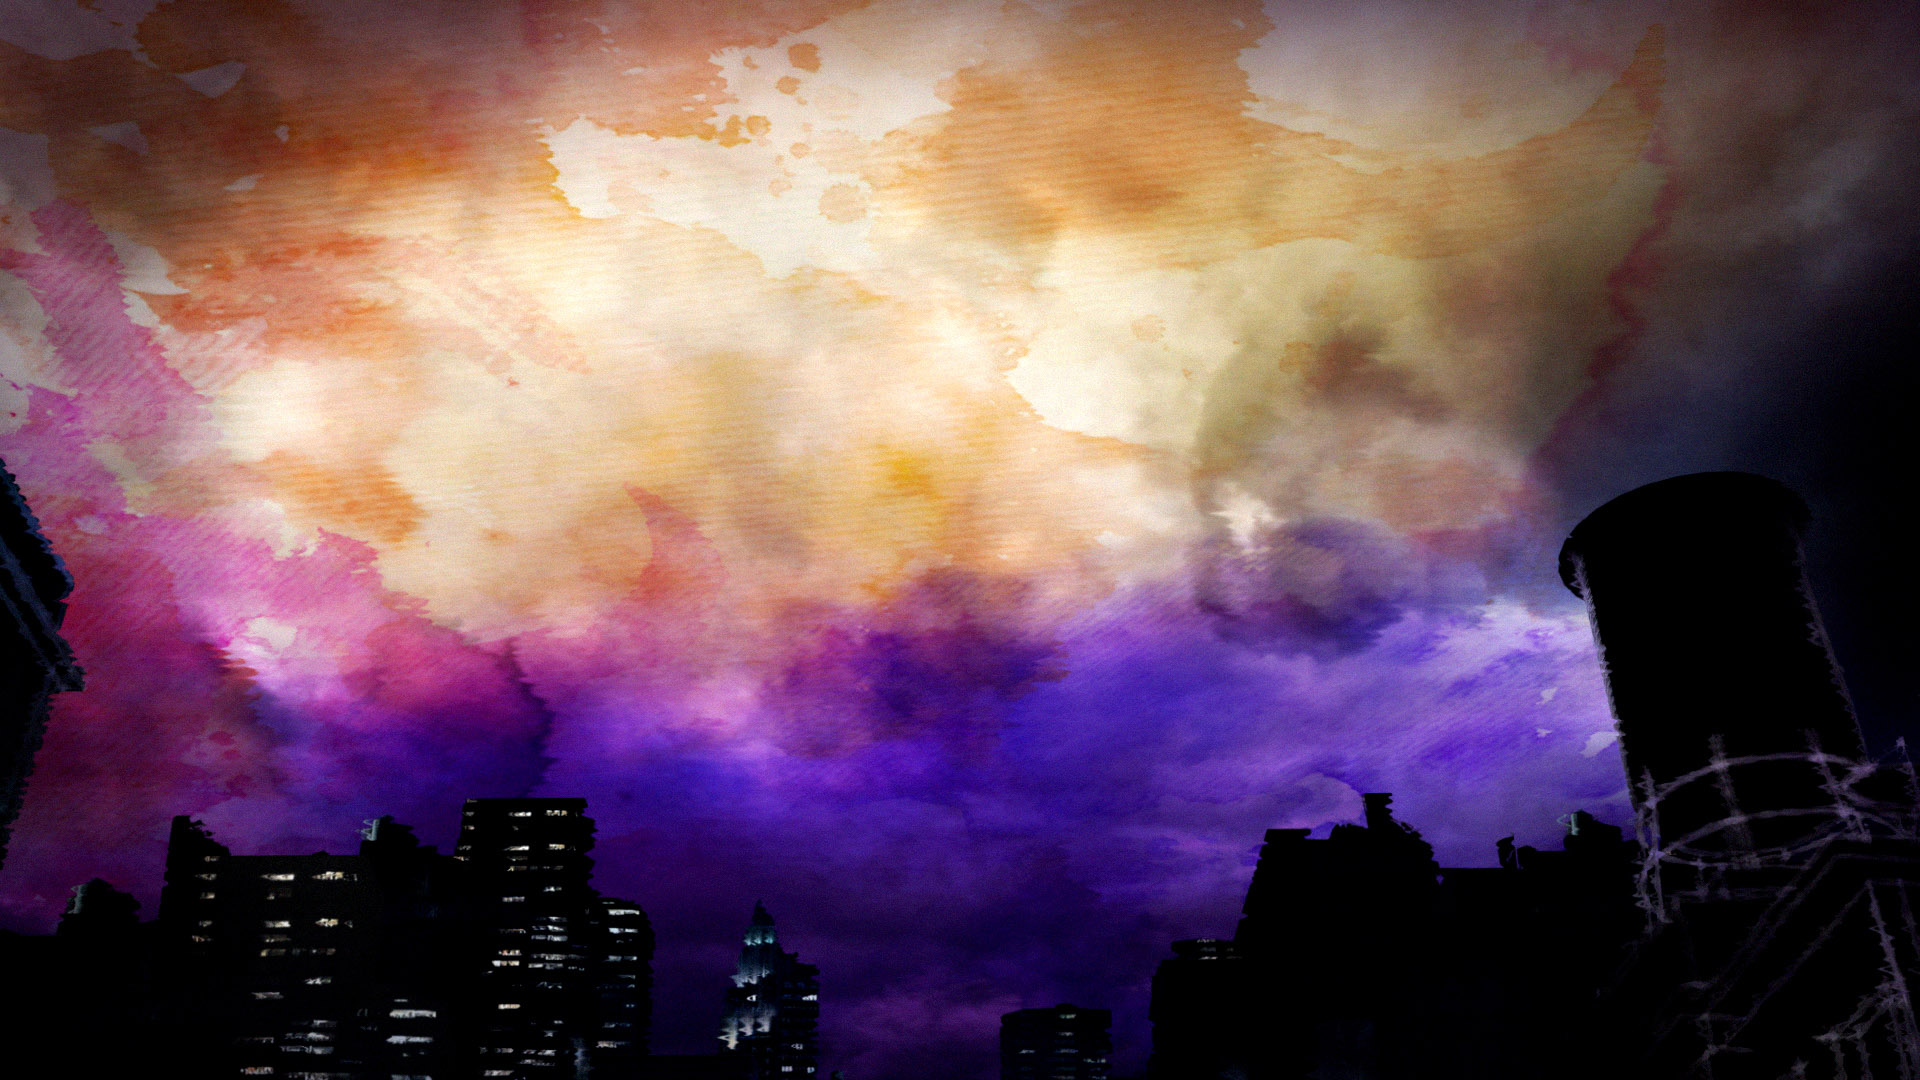 AKA_Teaser_Dreams_Texted_PreLaunch_Stereo_ProResHQ (00735)_web.jpg